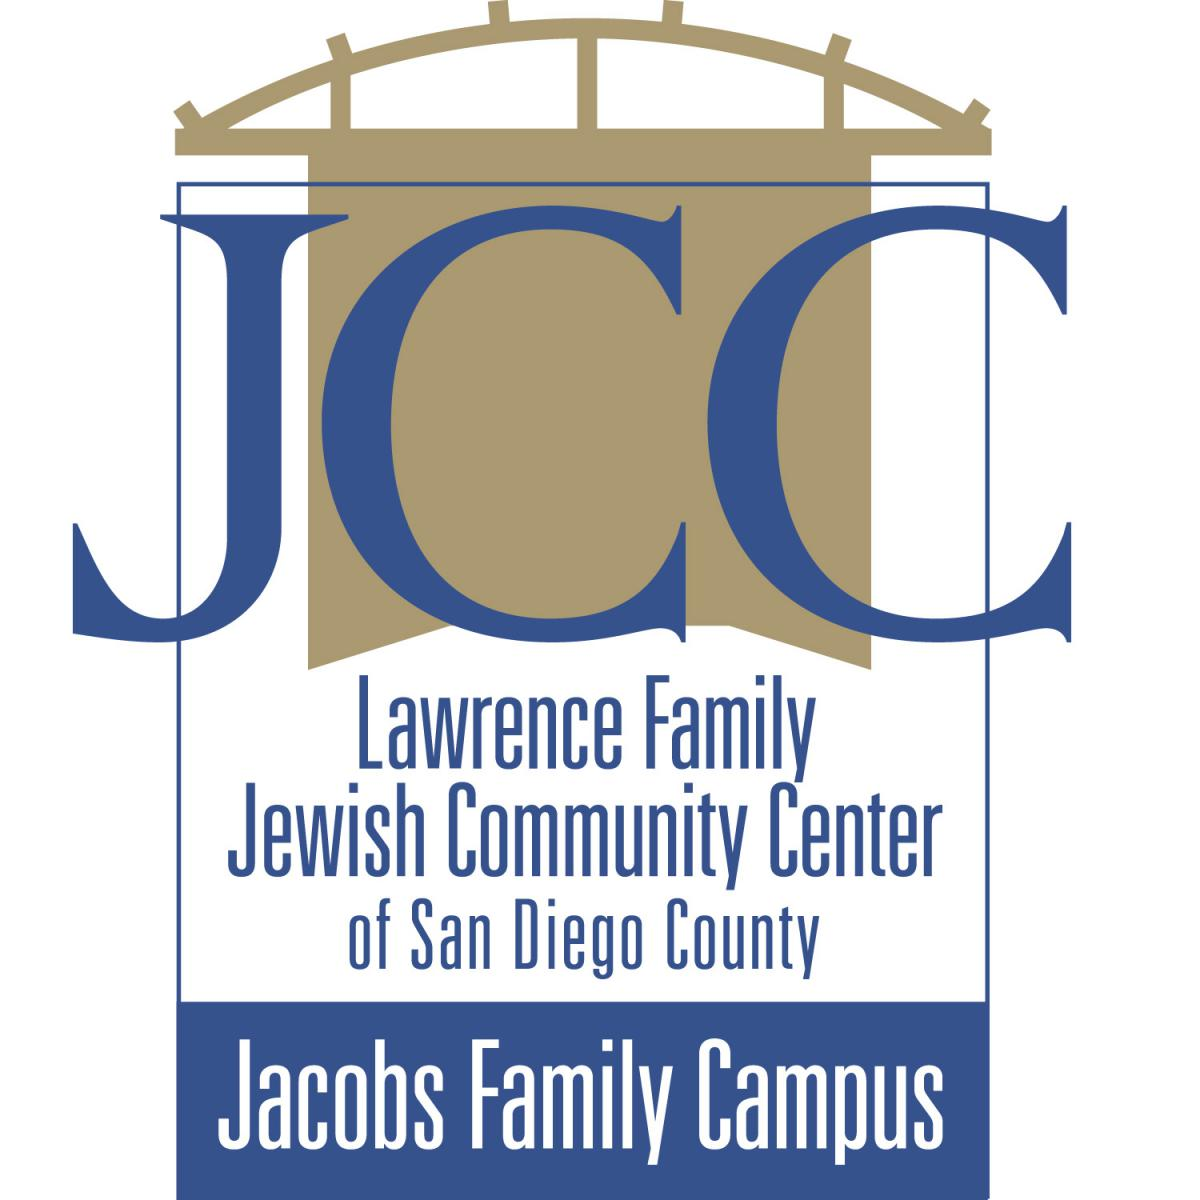 Lawrence Family Jewish Community Center